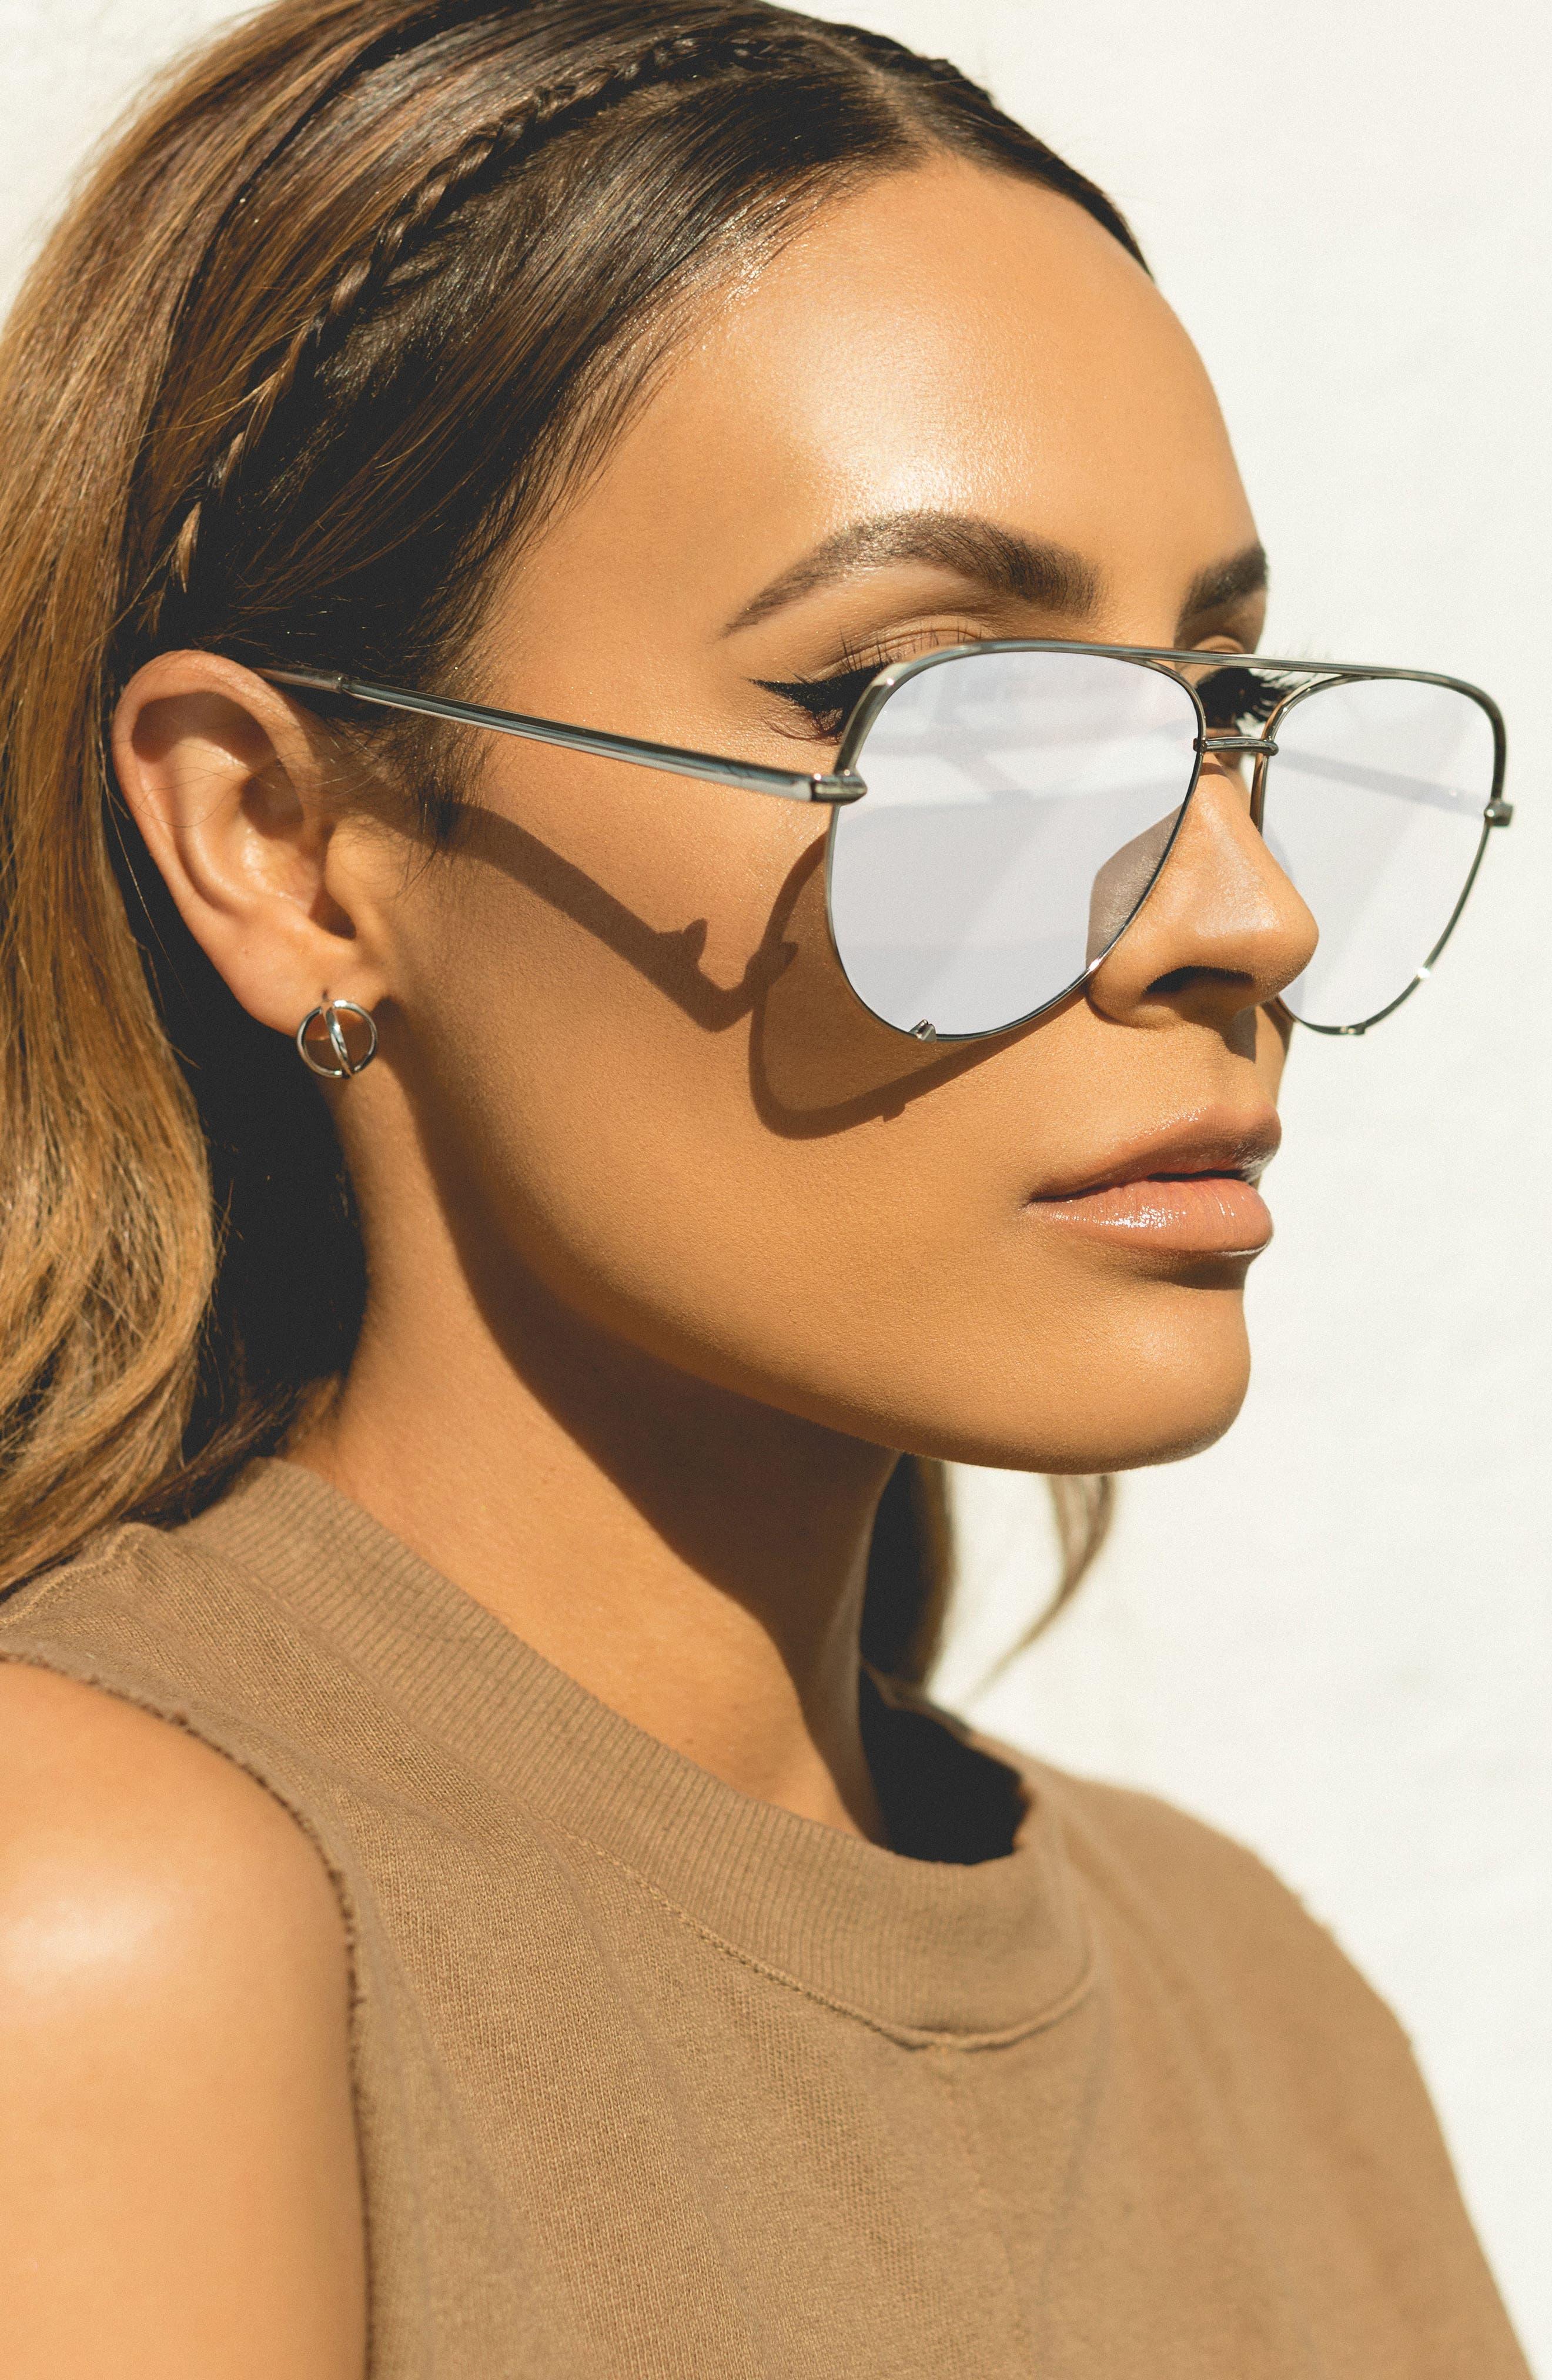 x Desi Perkins High Key 62mm Aviator Sunglasses,                             Alternate thumbnail 3, color,                             SILVER/ SILVER